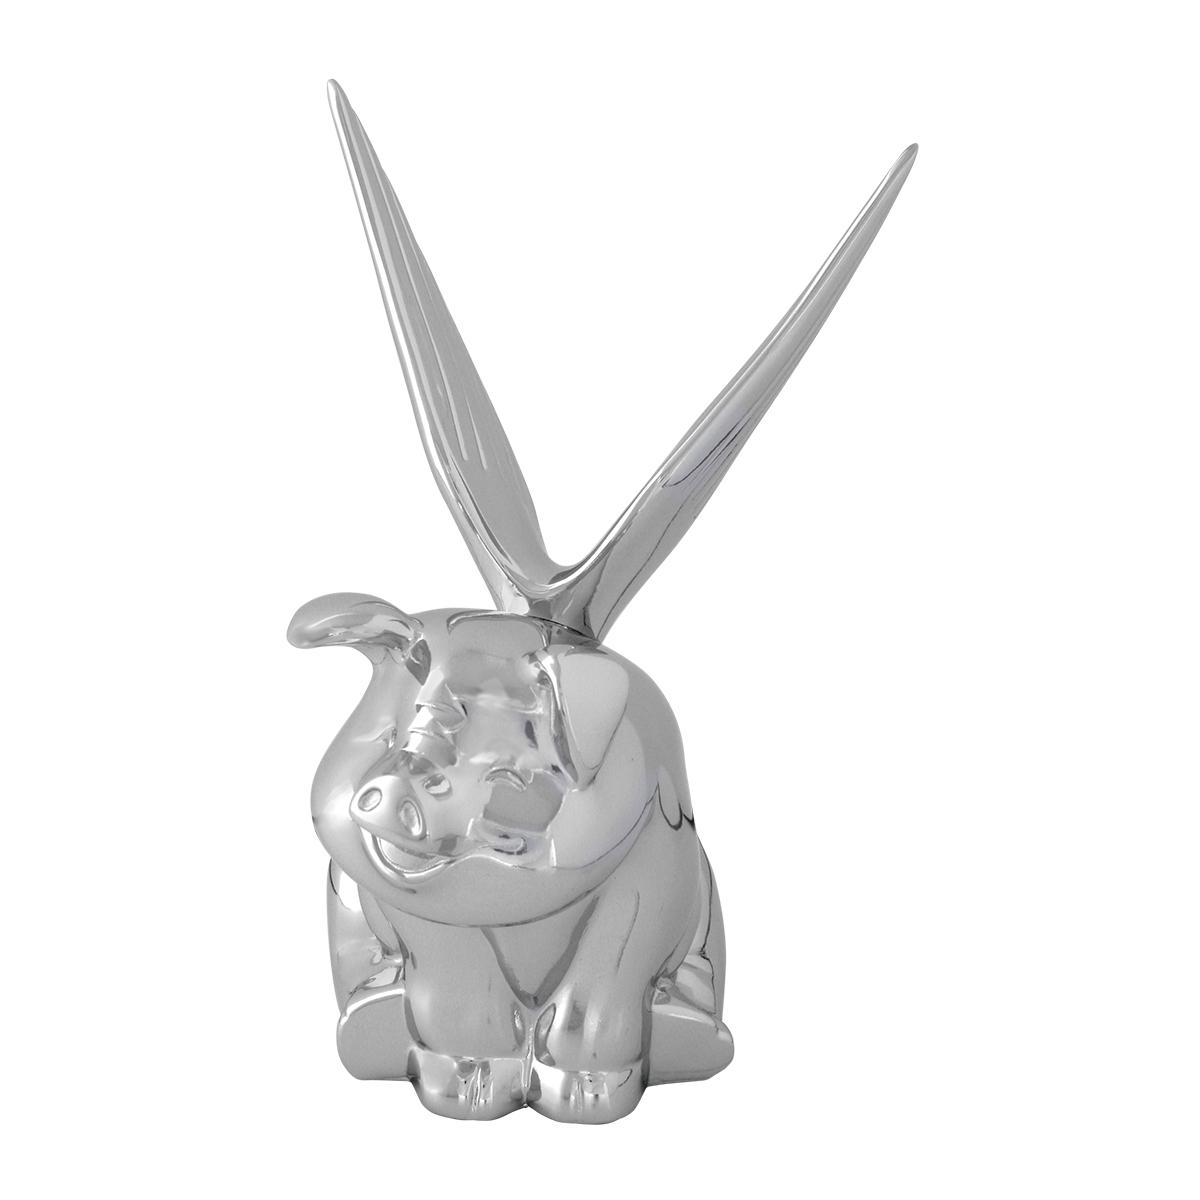 Chrome Die Cast Winged Pig Hood Ornament